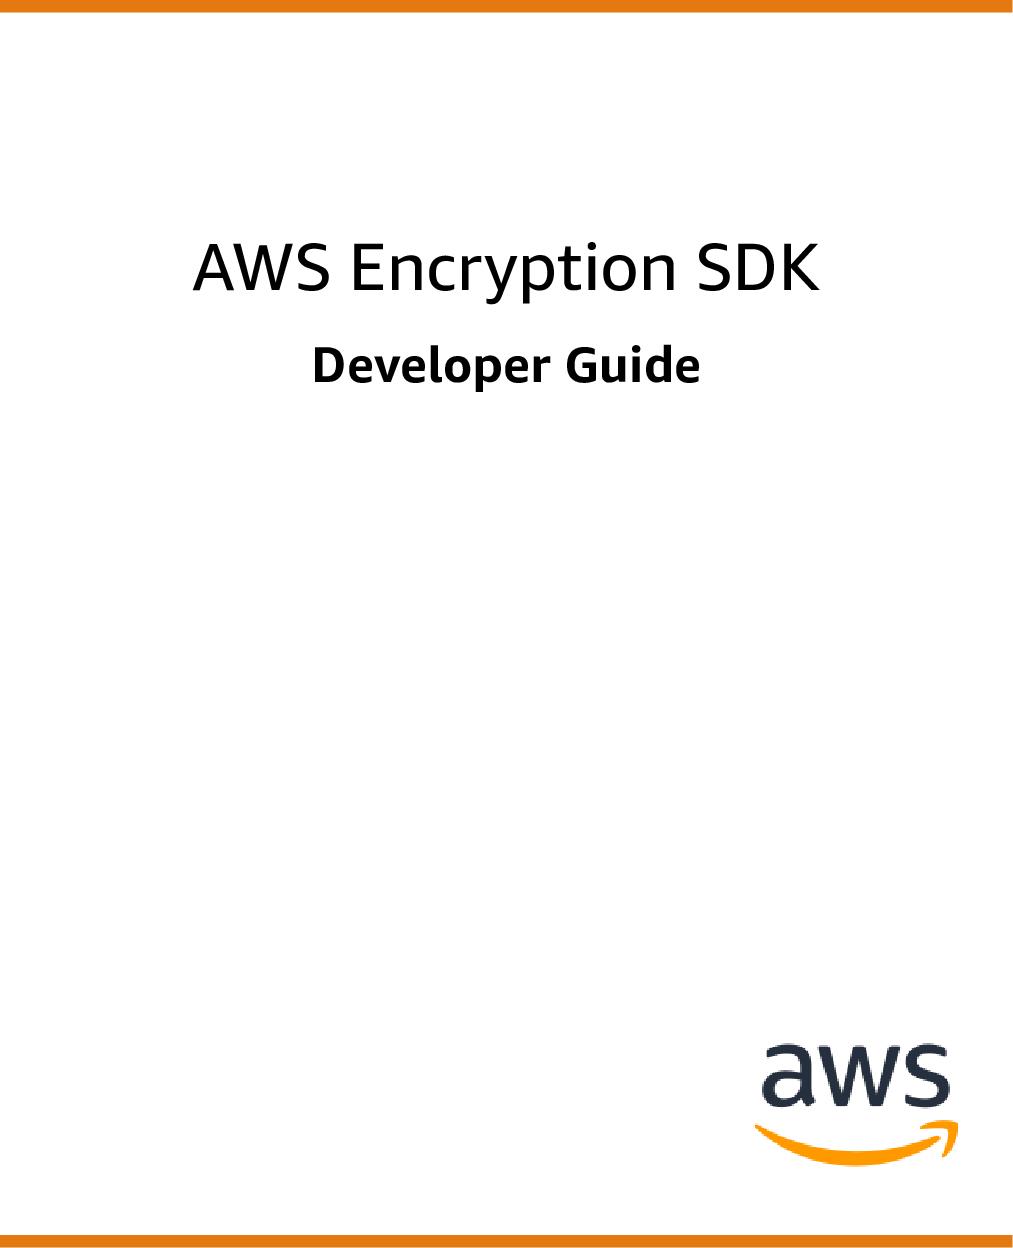 AWS Encryption SDK Developer Guide